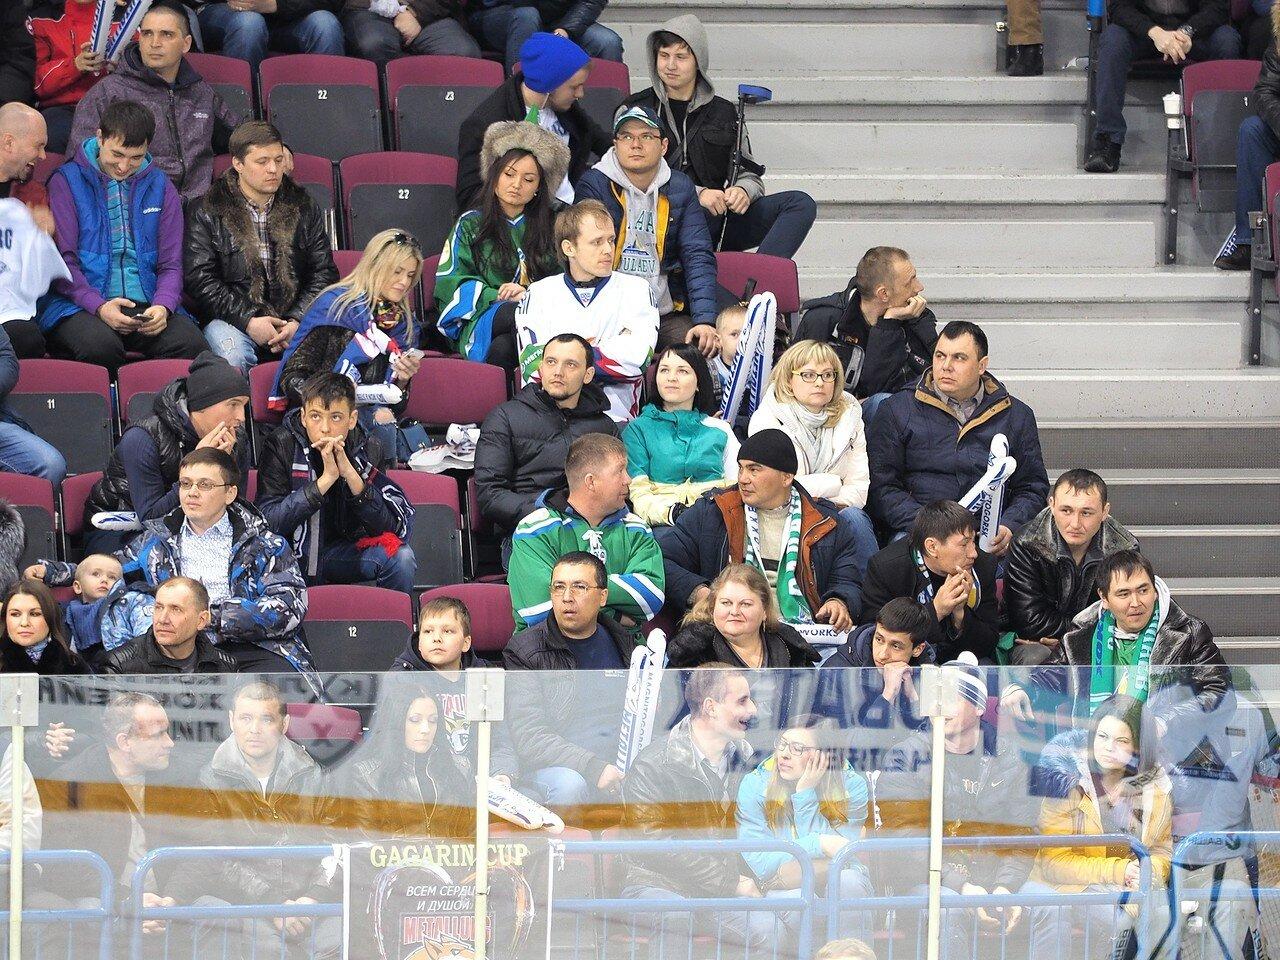 141Плей-офф 2016 Восток Финал Металлург - Салават Юлаев 23.03.2016